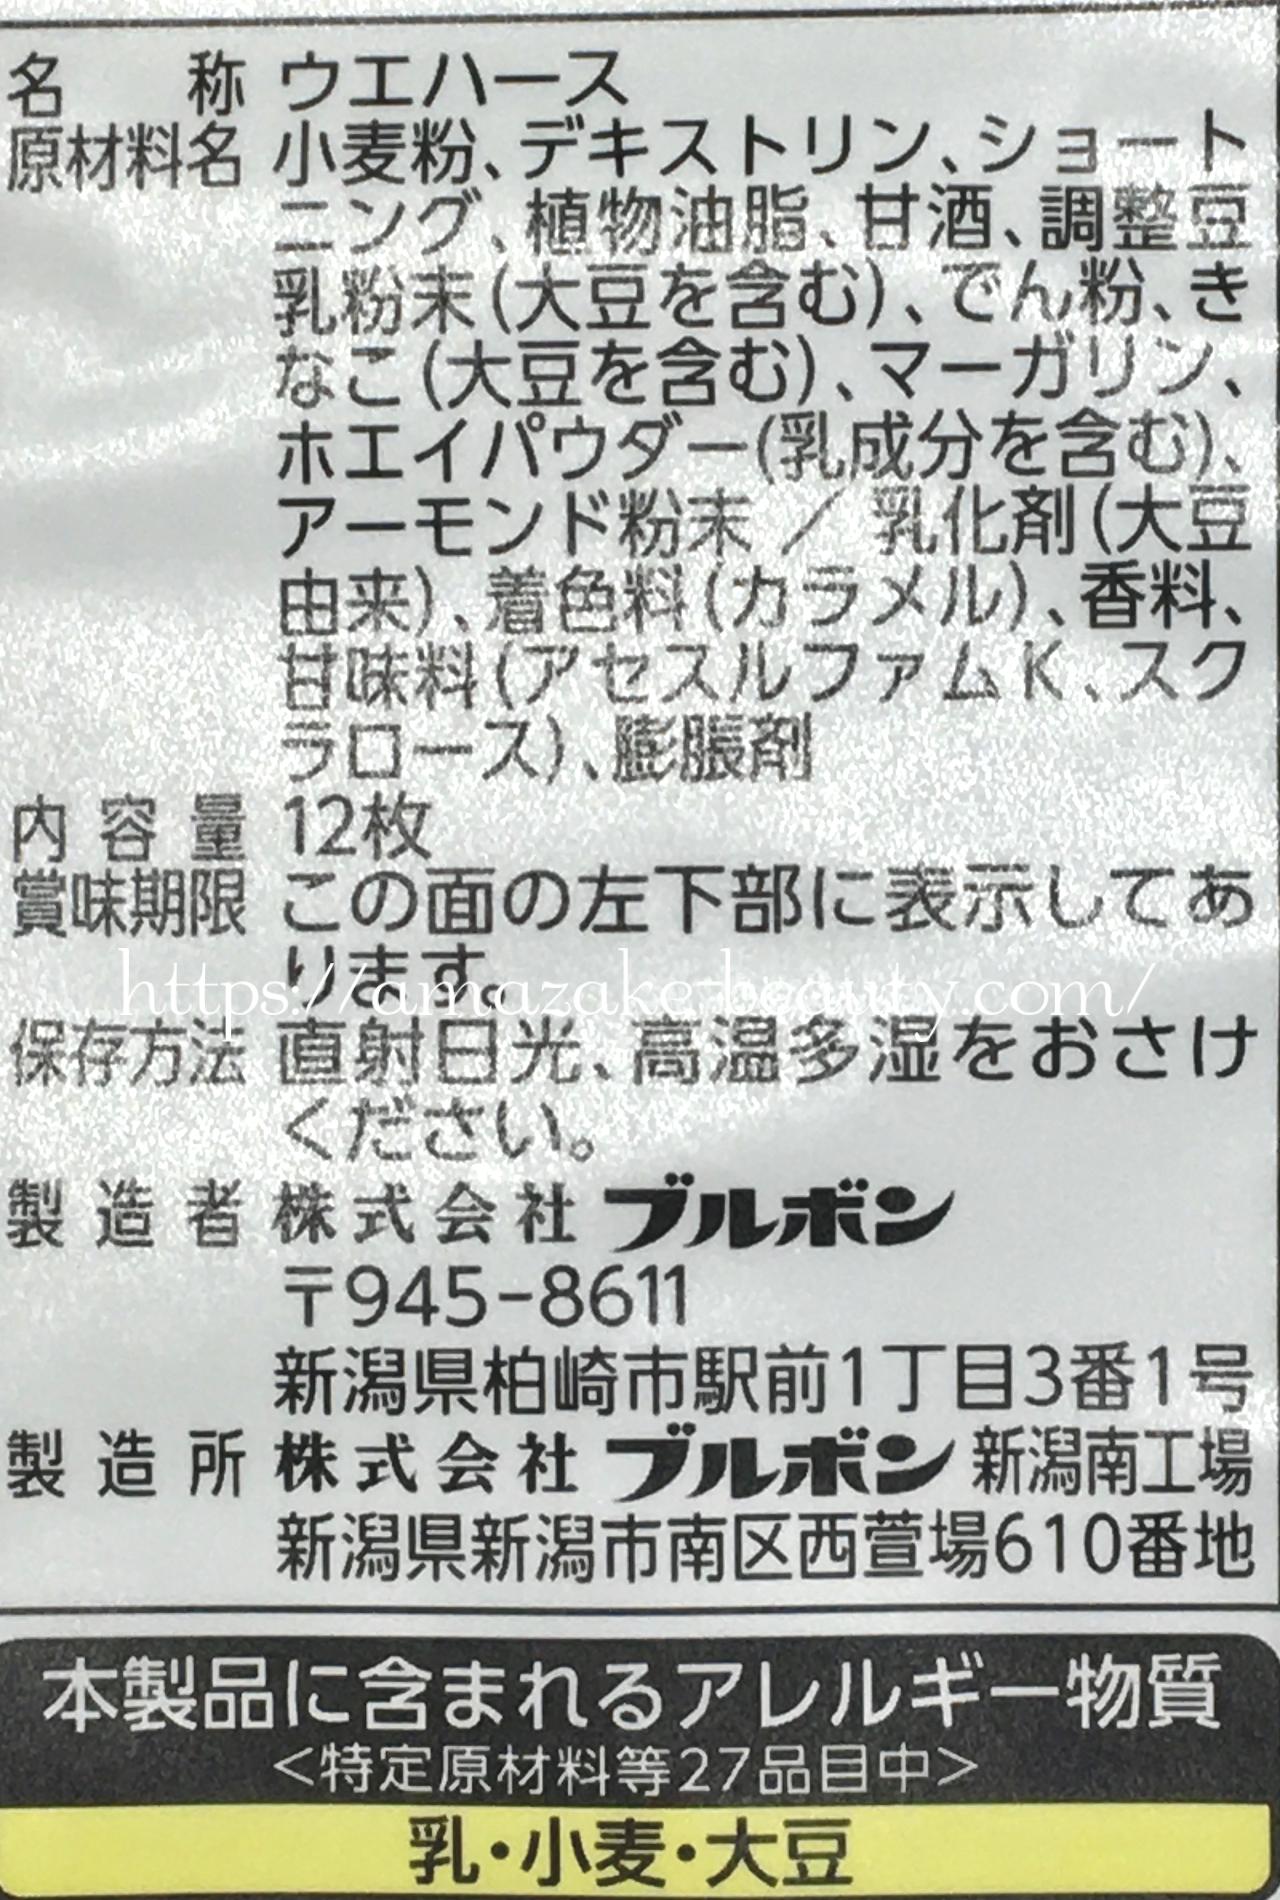 [amazake sweets]burubon[amazake jitate no uehasu](product description)